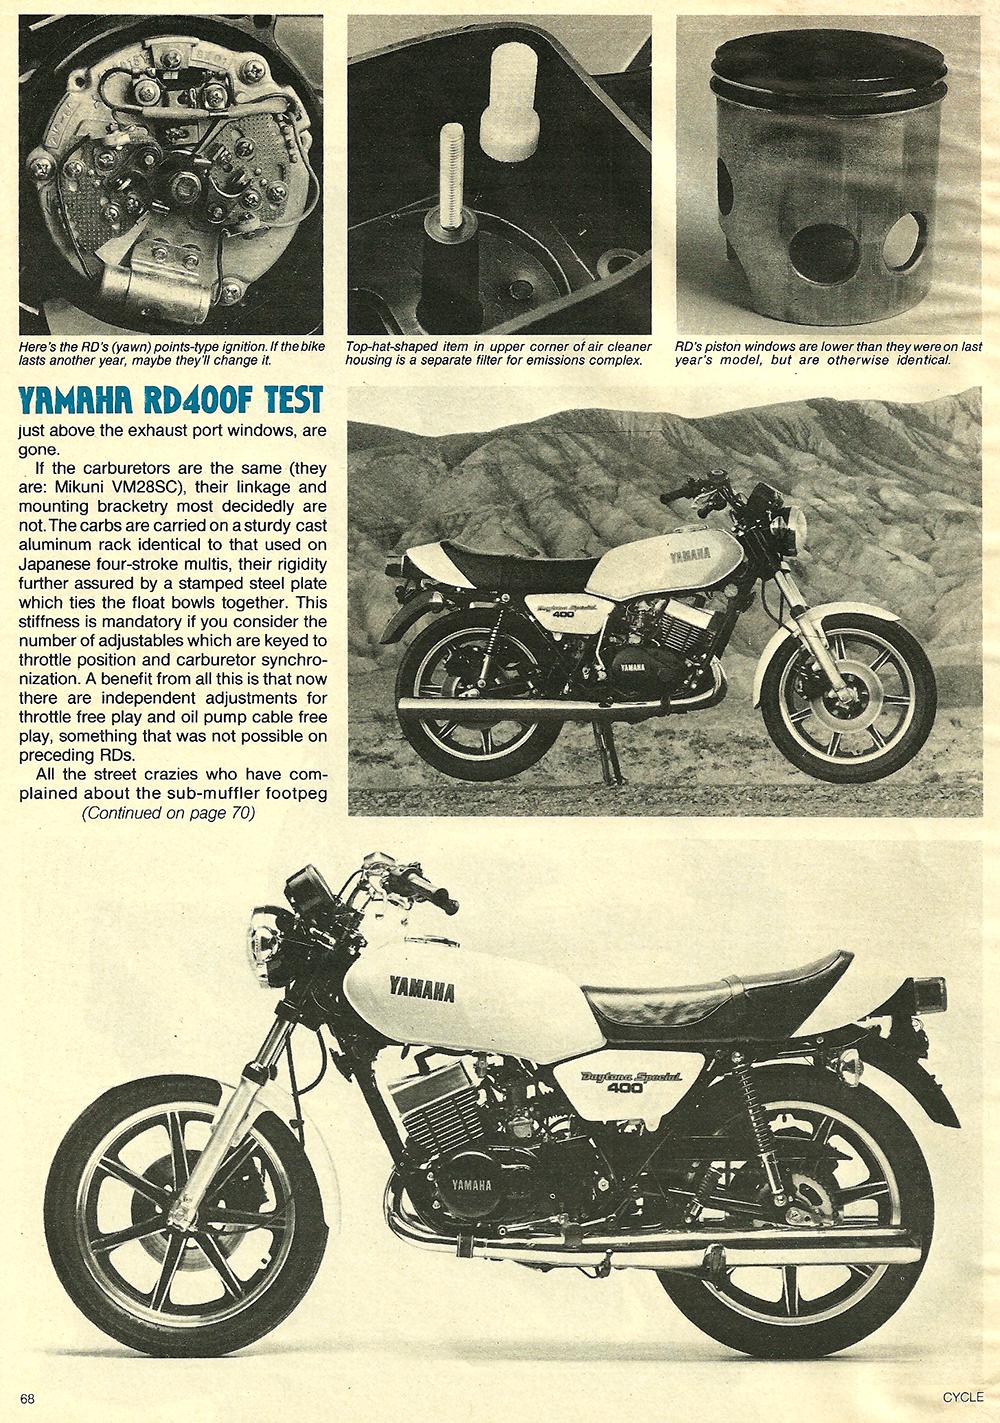 1979 Yamaha RD400F road test 07.jpg